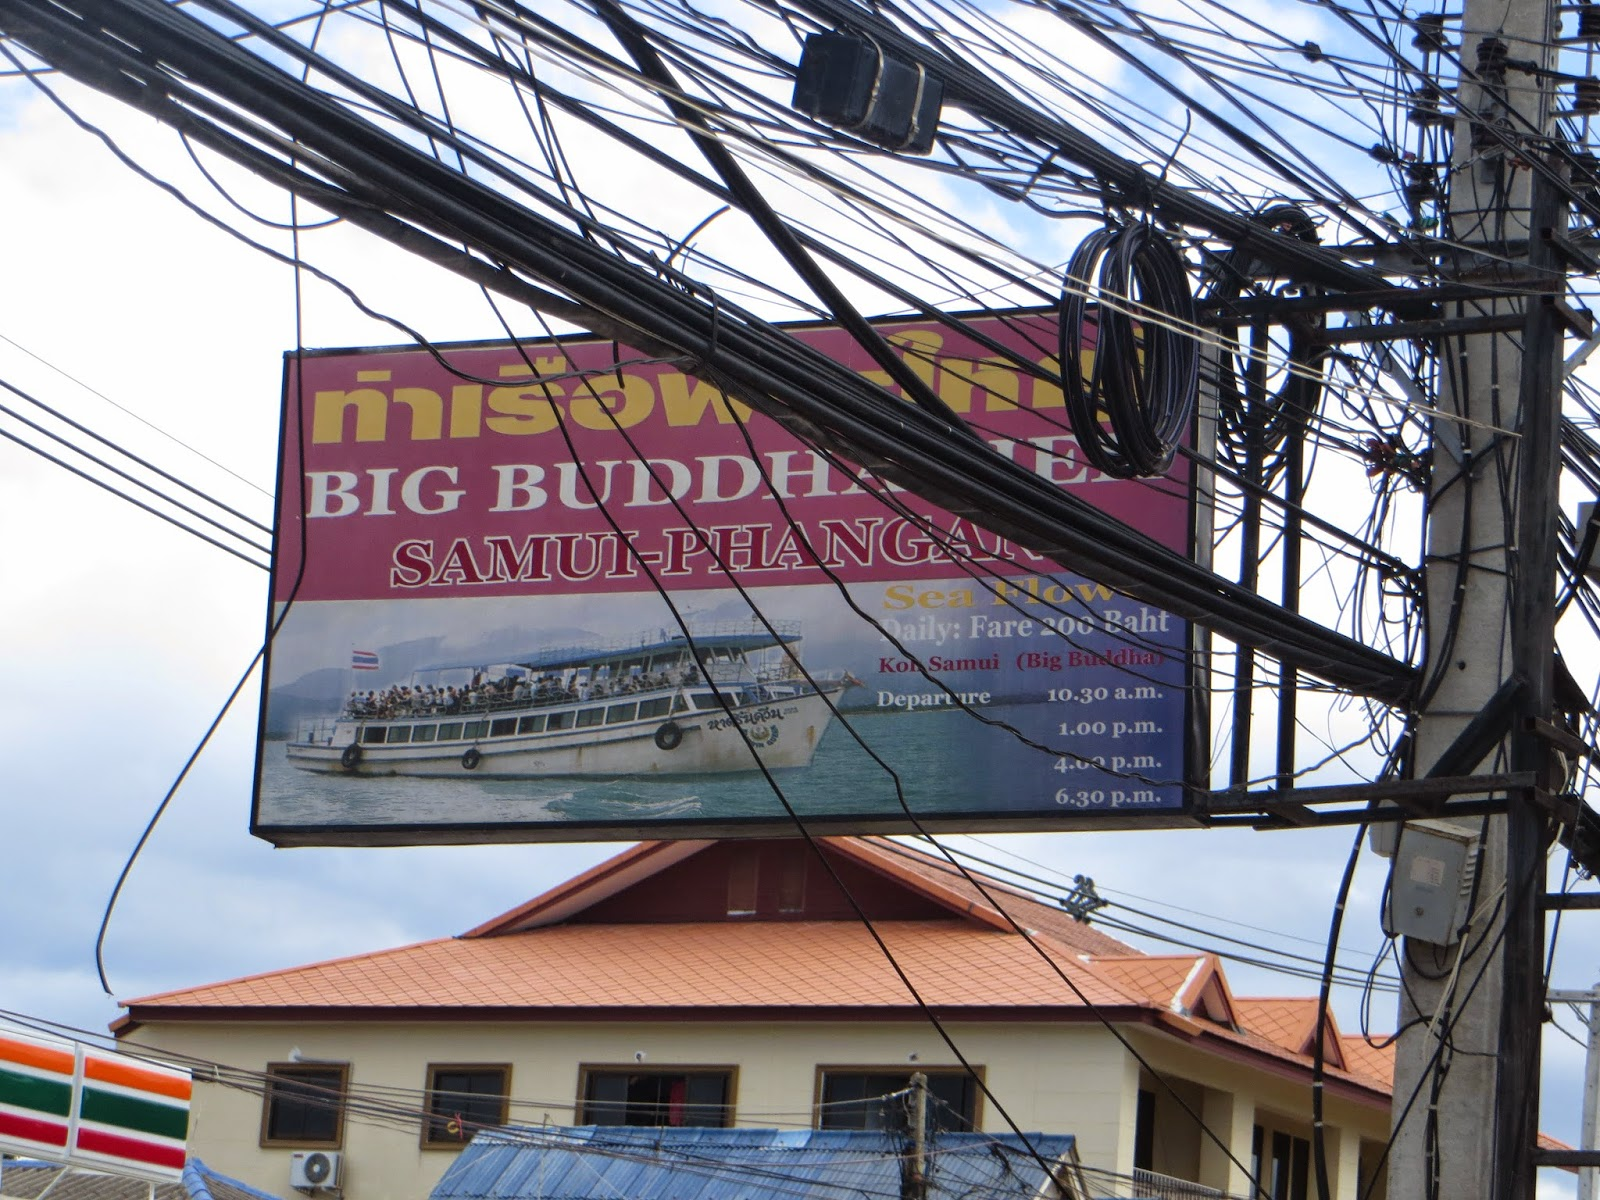 указатель пирса Биг Будды